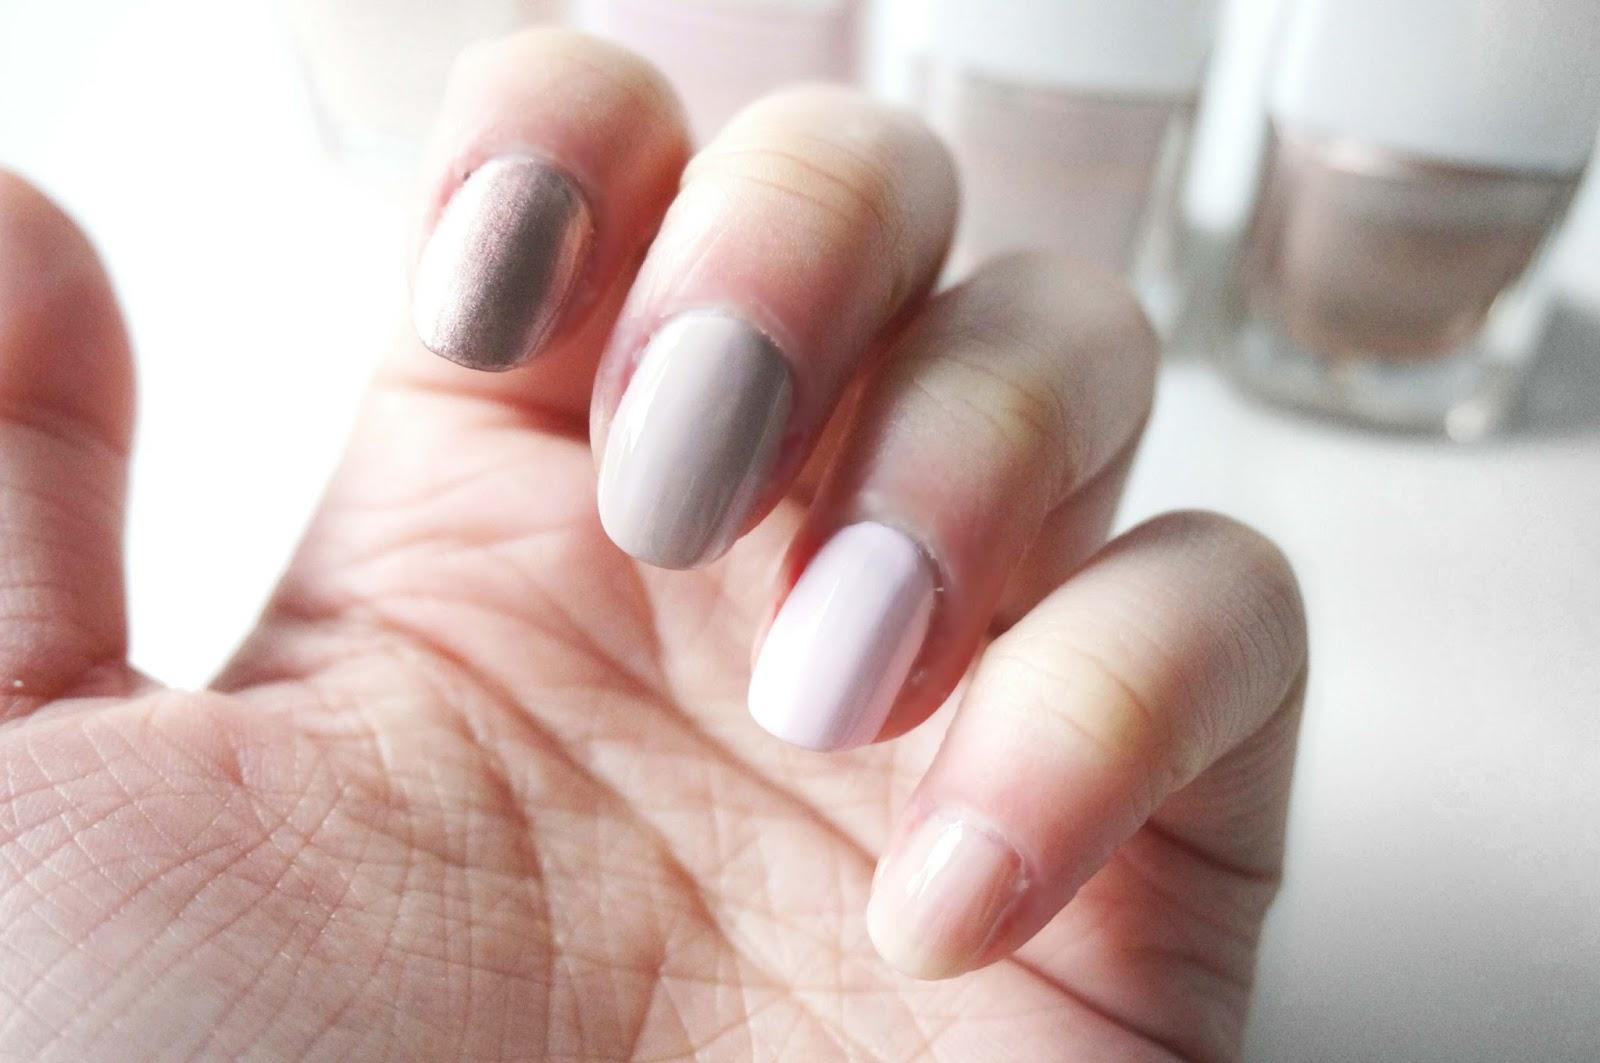 Joyce Lau Ted Baker Perfectly Polished Nail Polish Gift Set Review